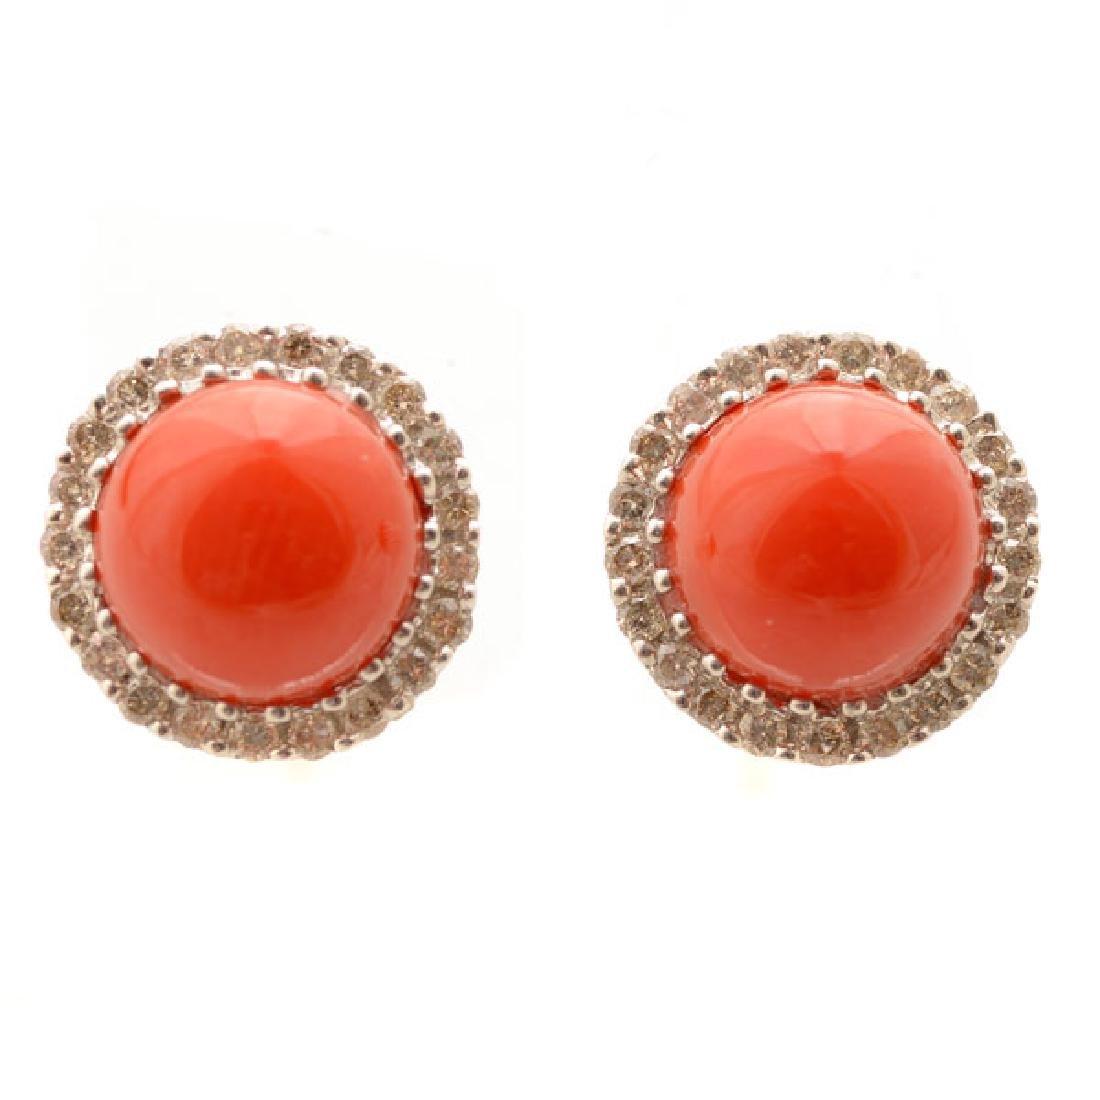 *Pair of Coral, Diamond, 14k White Gold Stud Earrings.